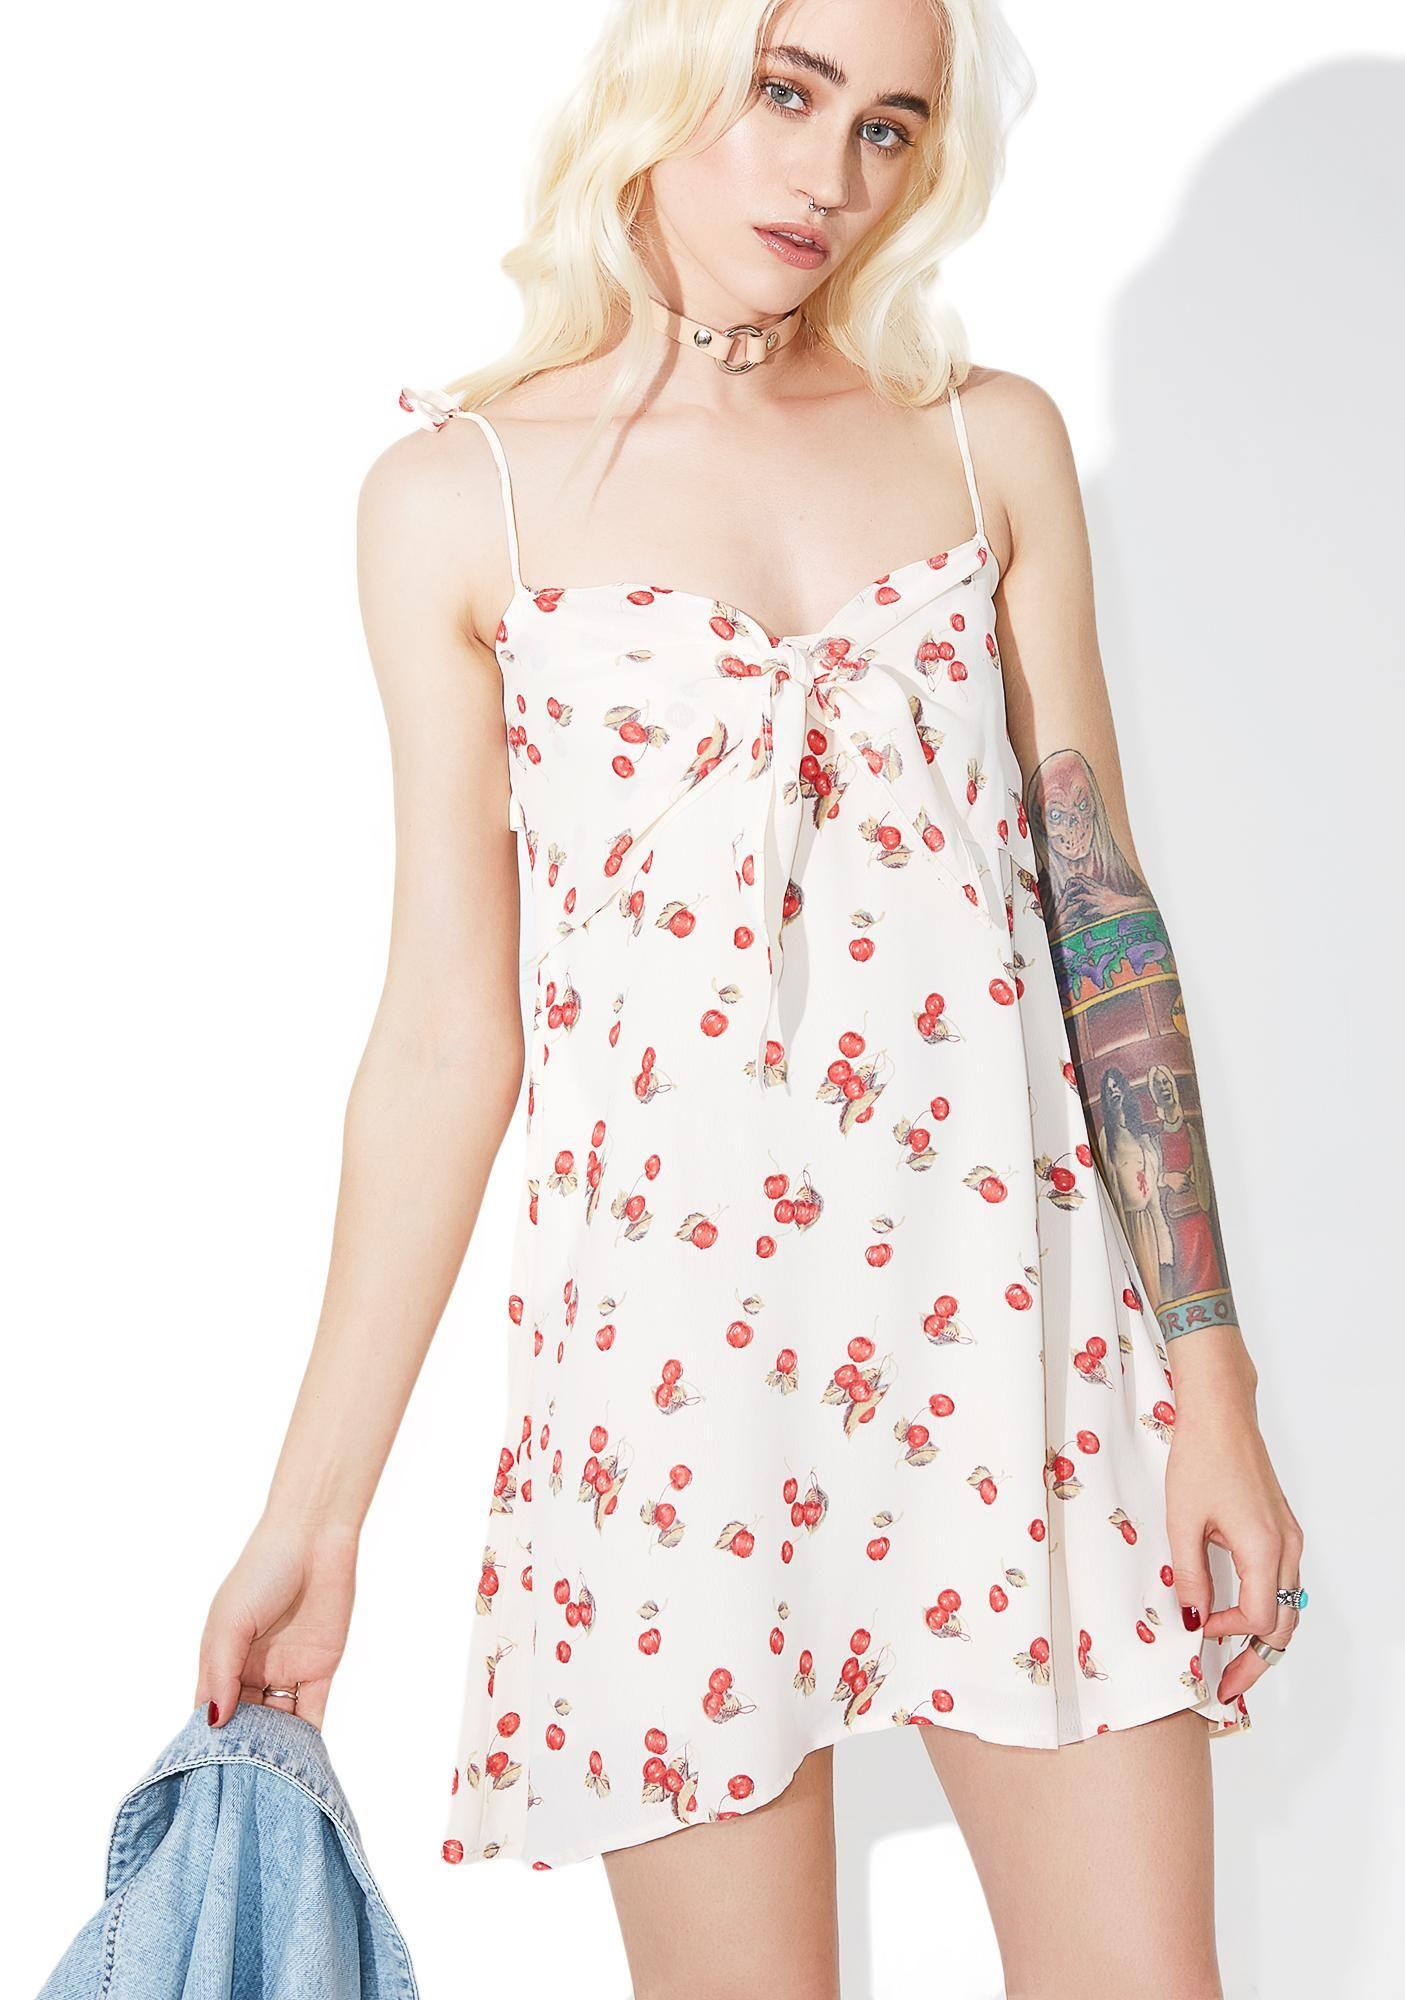 Cherry Tank Dress Tank Dress Fashion Embroidered Dress [ 2000 x 1405 Pixel ]